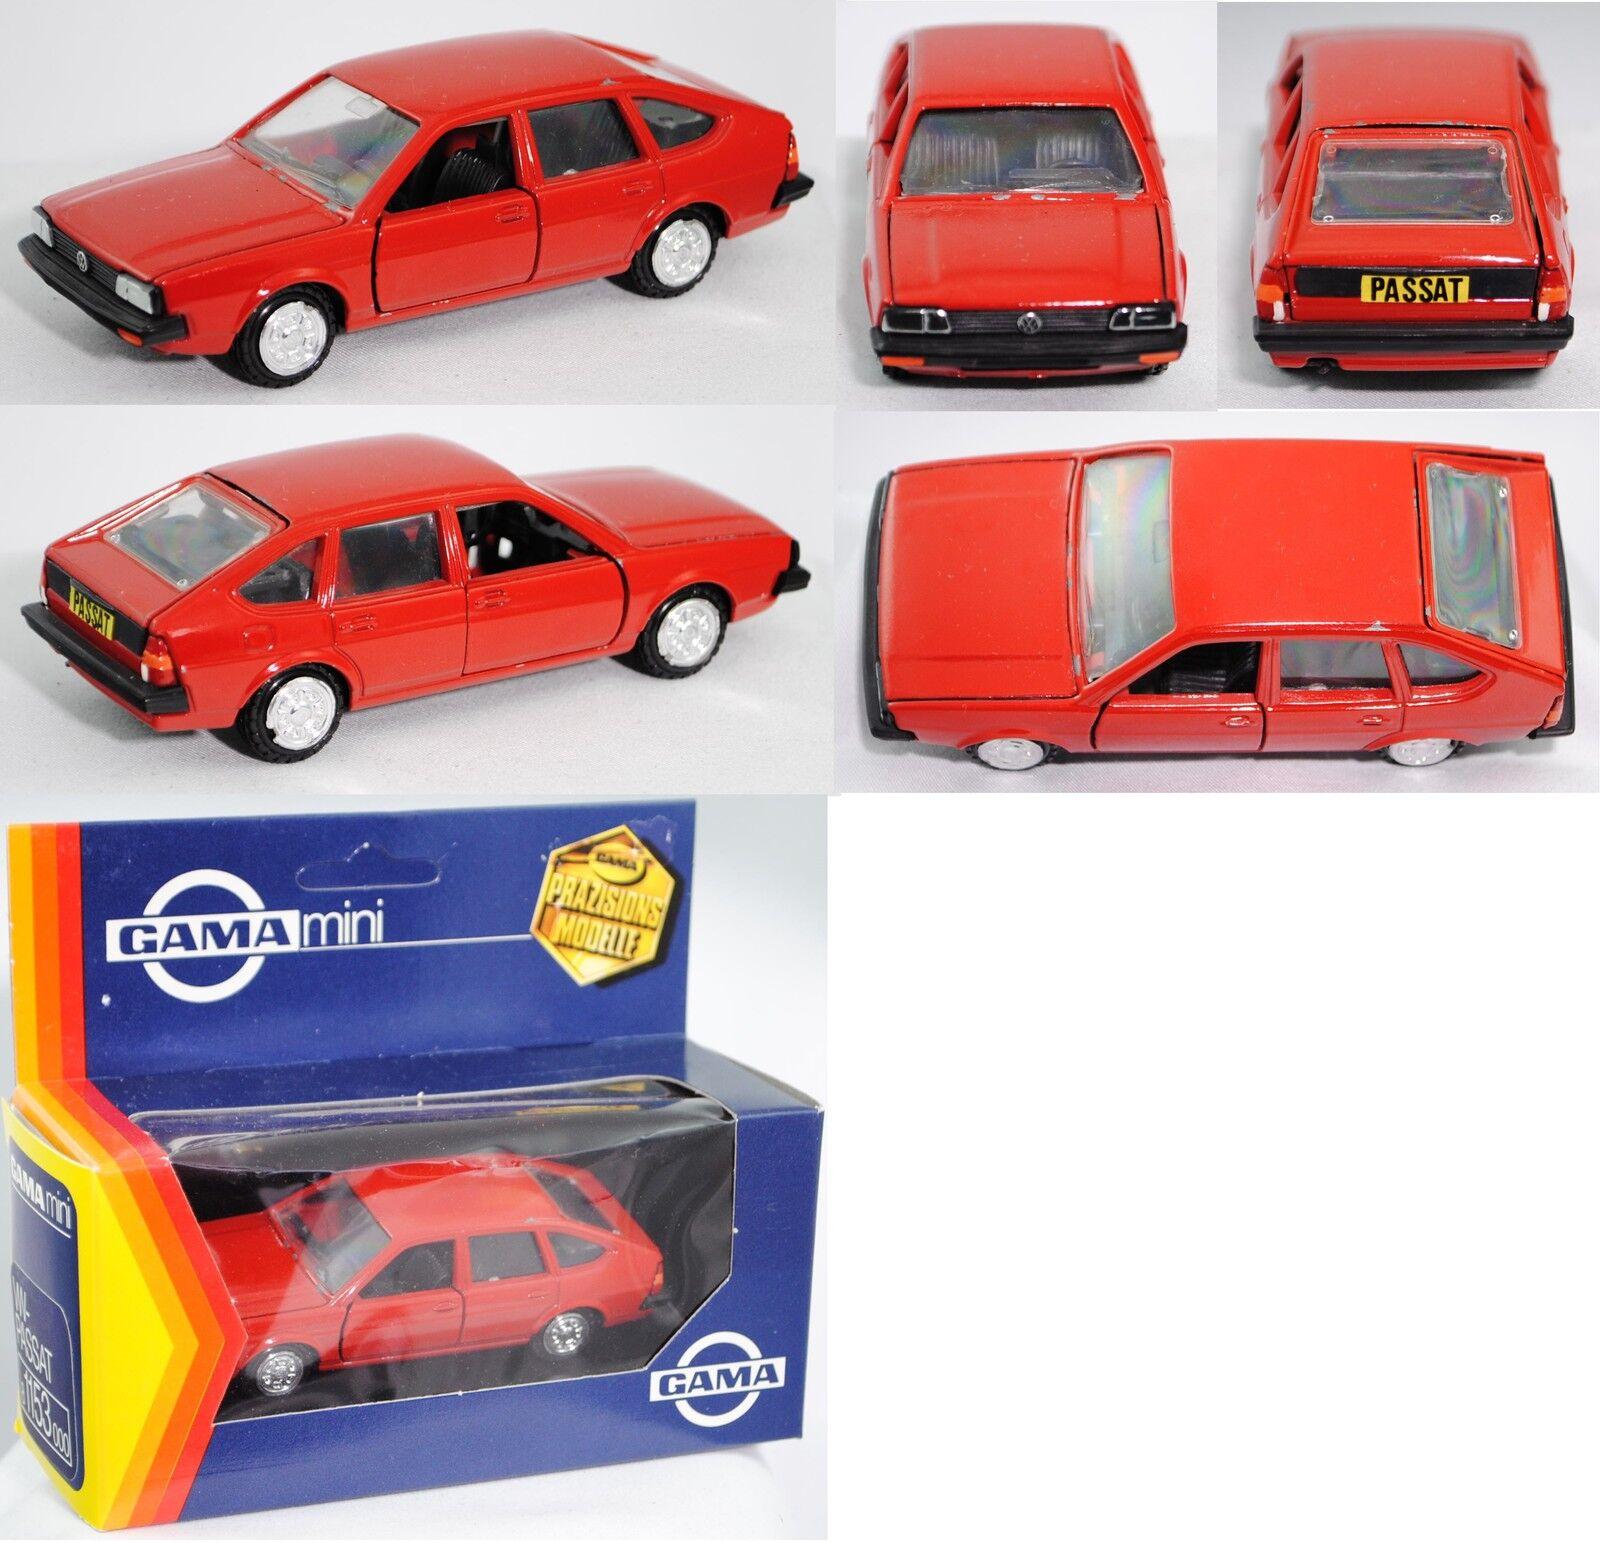 Conrad 1153 VW Passat Passat Passat Berline (b2, type 32b) Conrad GAMA MINI, 1 43, NEUF dans sa boîte 7de9cc